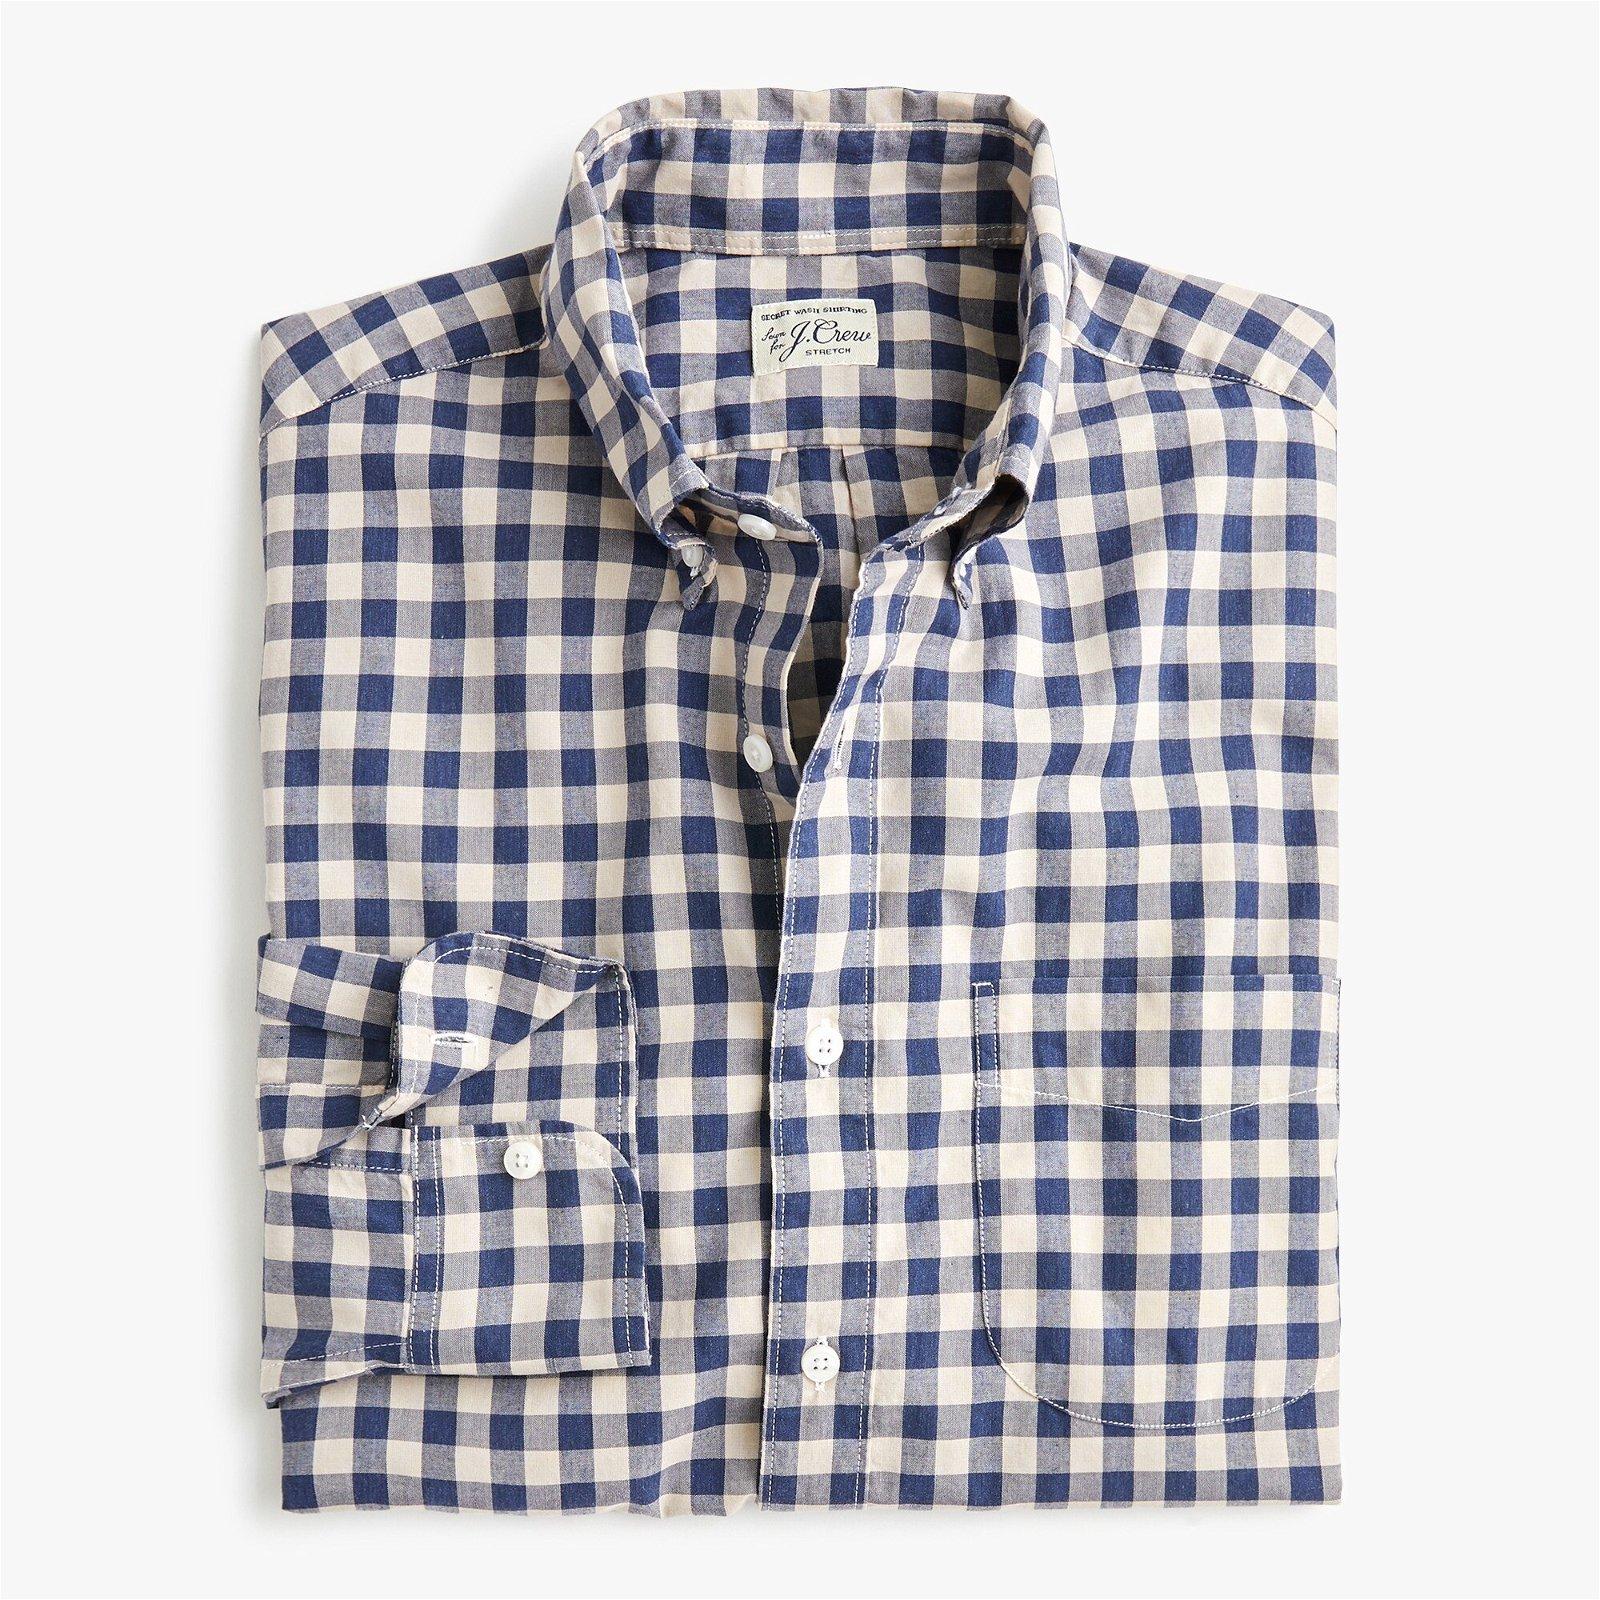 Classic Stretch Secret Wash shirt in heathered gingham